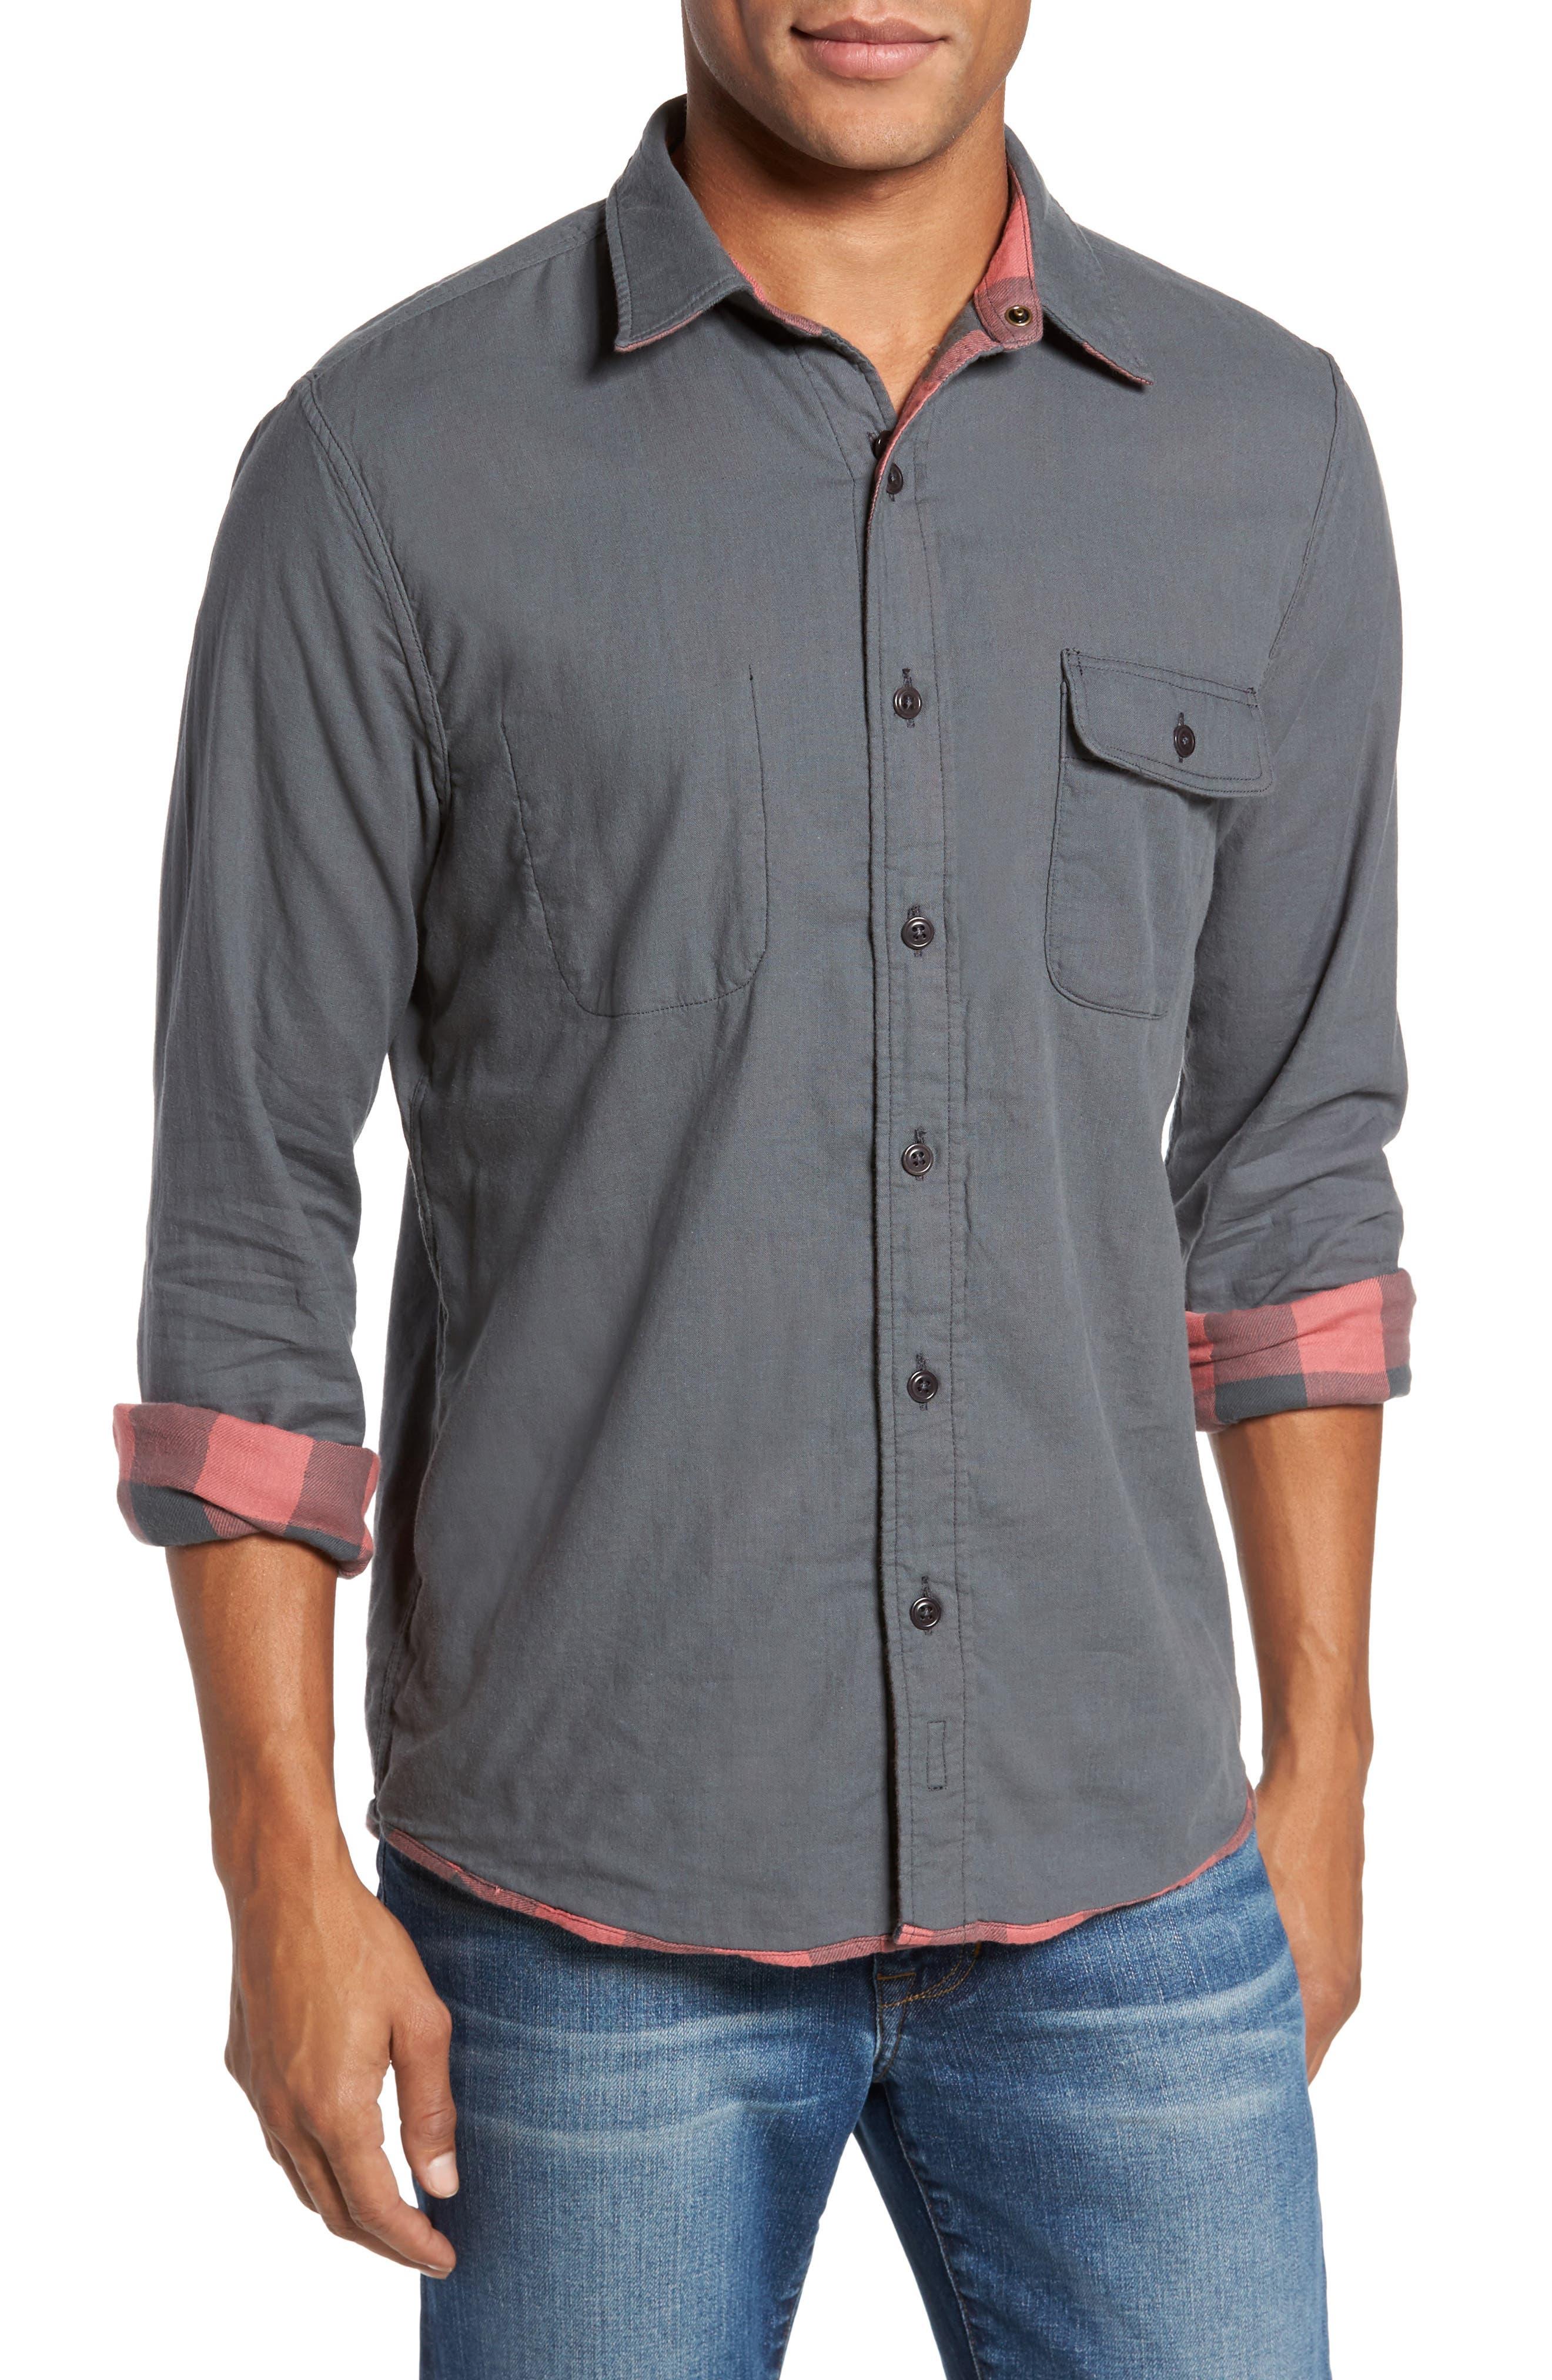 Belmar Trim Fit Long Sleeve Reversible Sport Shirt,                             Alternate thumbnail 4, color,                             Grey / Red Buffalo Check